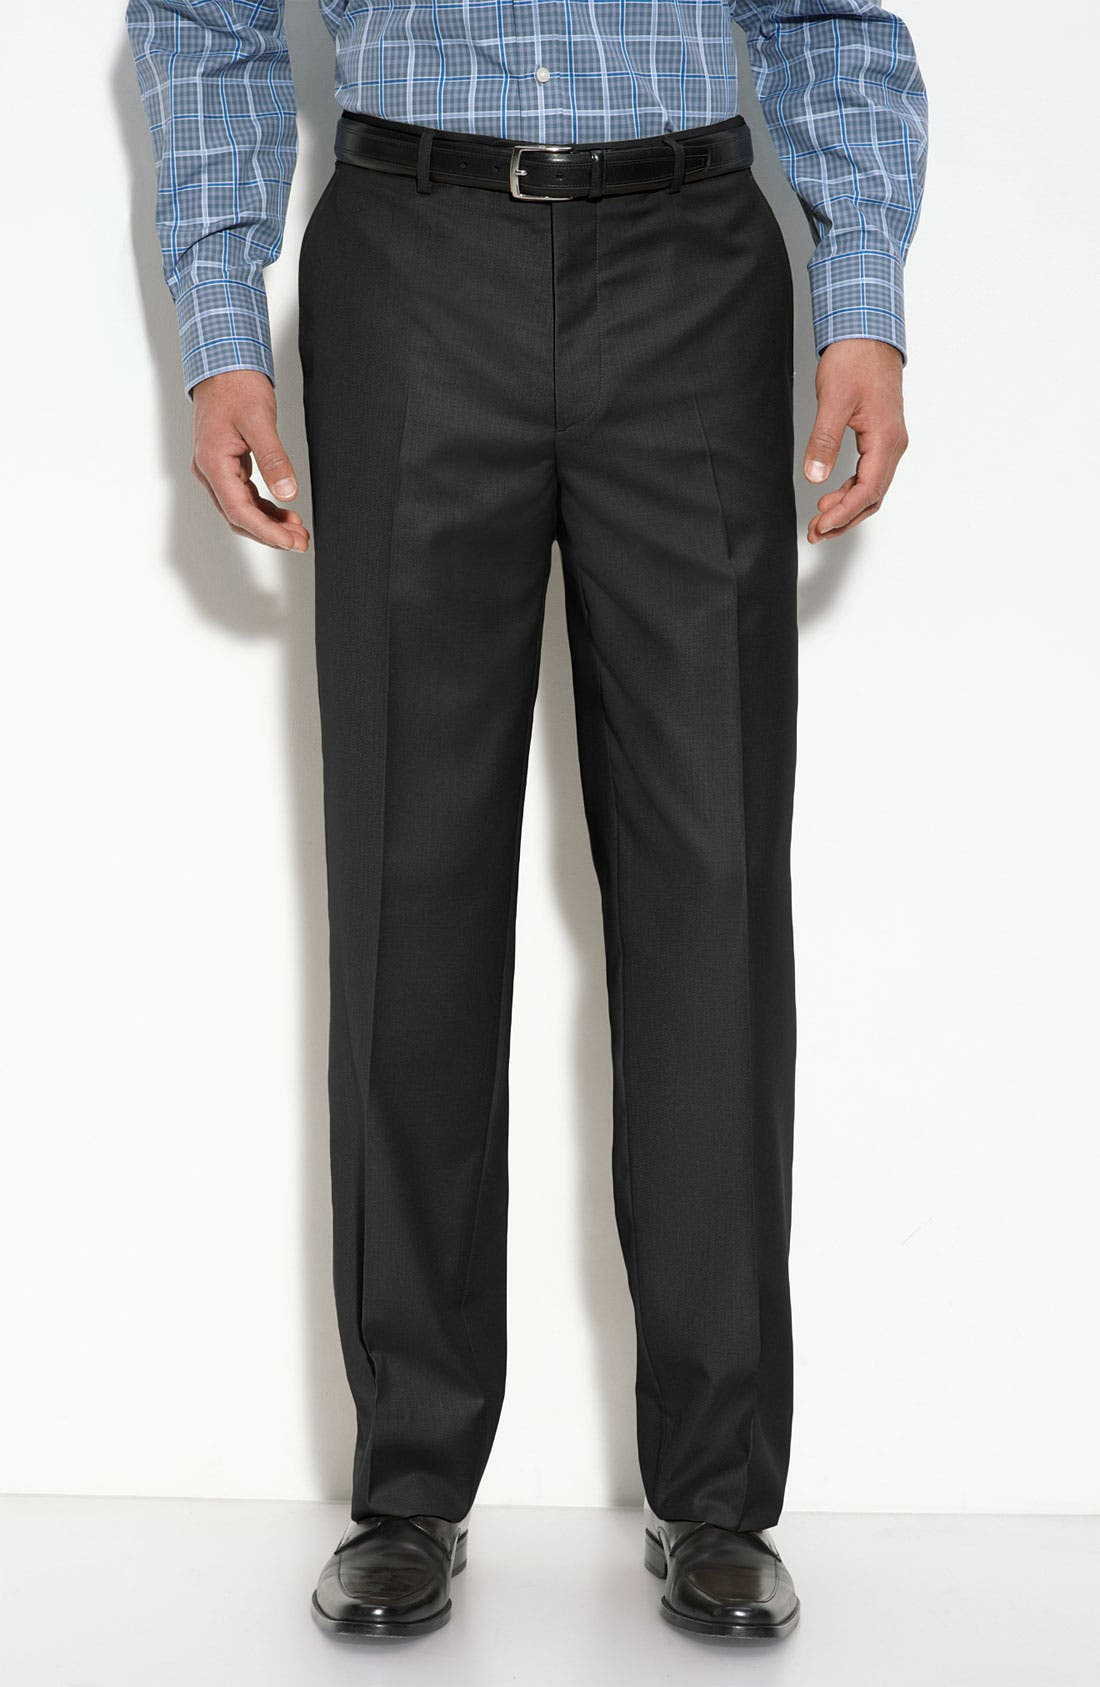 'Travel Genius - Hawk' Flat Front Pants,                             Main thumbnail 1, color,                             001